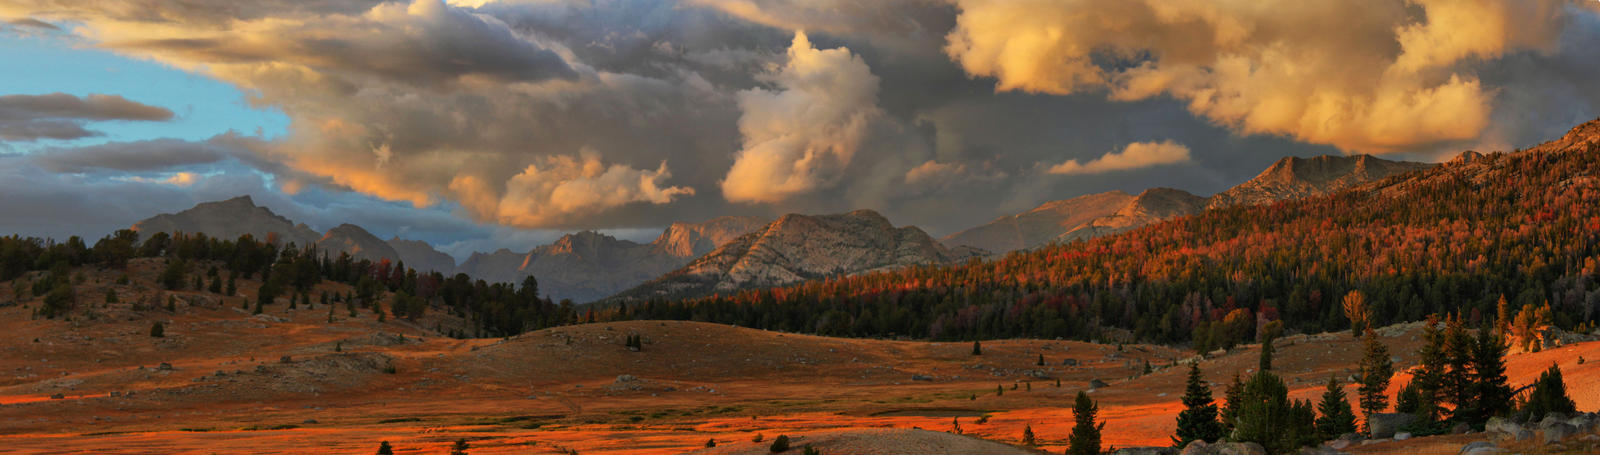 The Oregon Trail by Halcyon1990